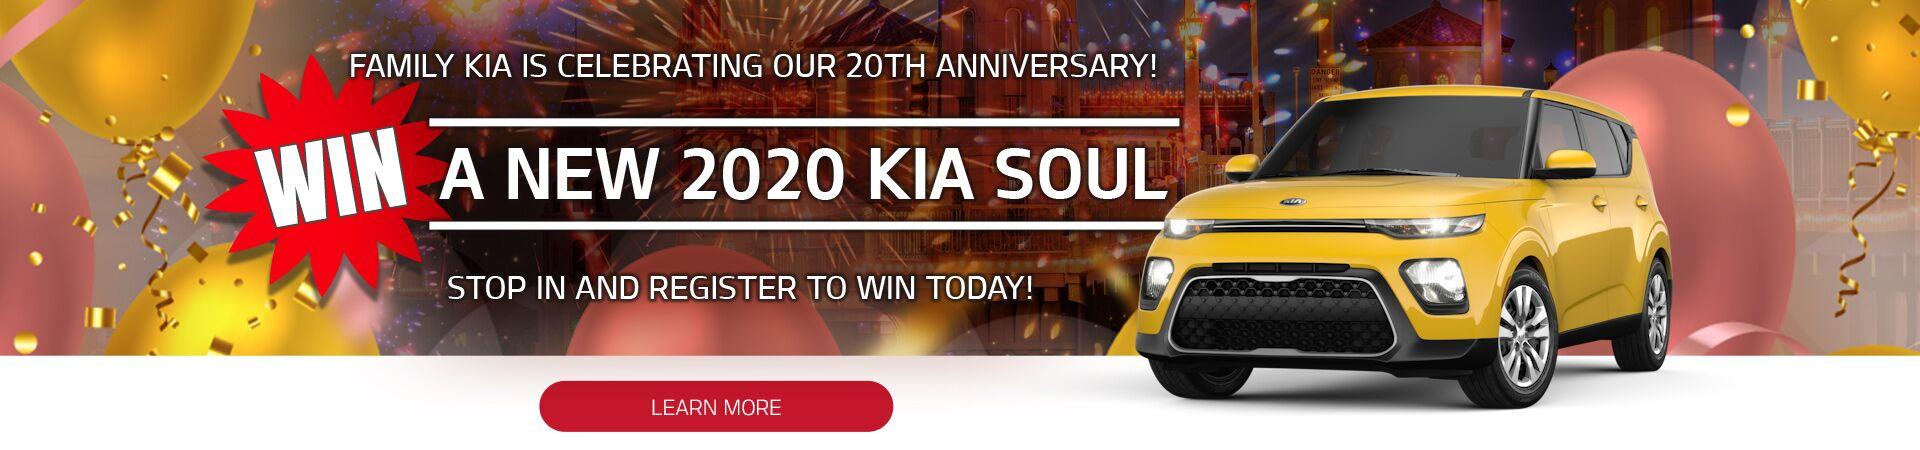 Family Kia 20th Anniversary 2020 Kia Soul Giveaway